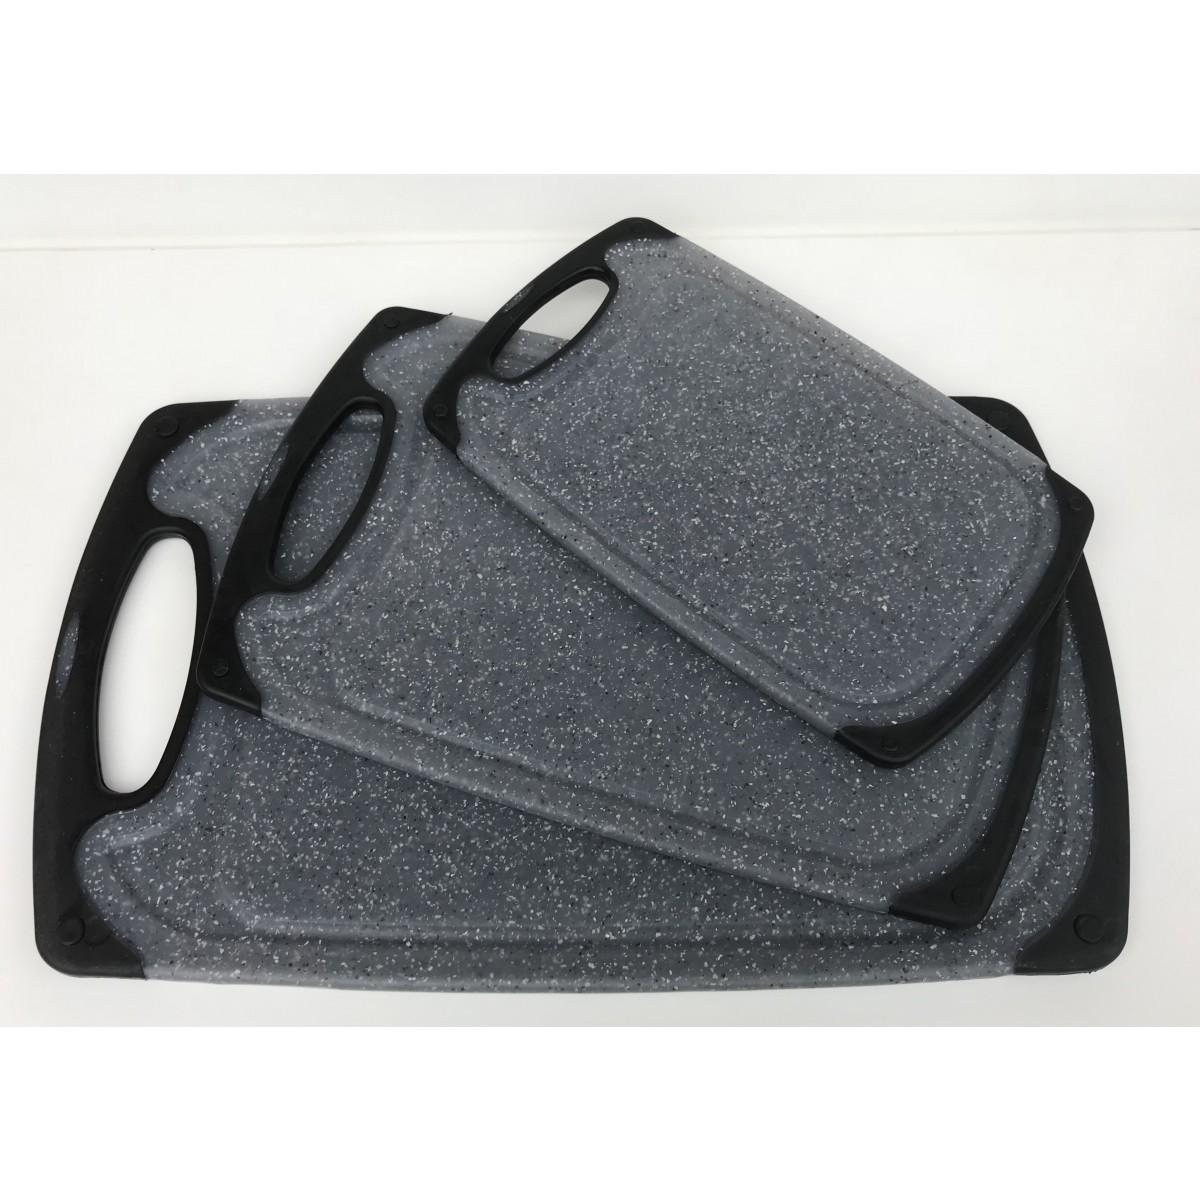 CONZEPT Skærebræt grå plast 40 x 24,5 x 0,9 cm.